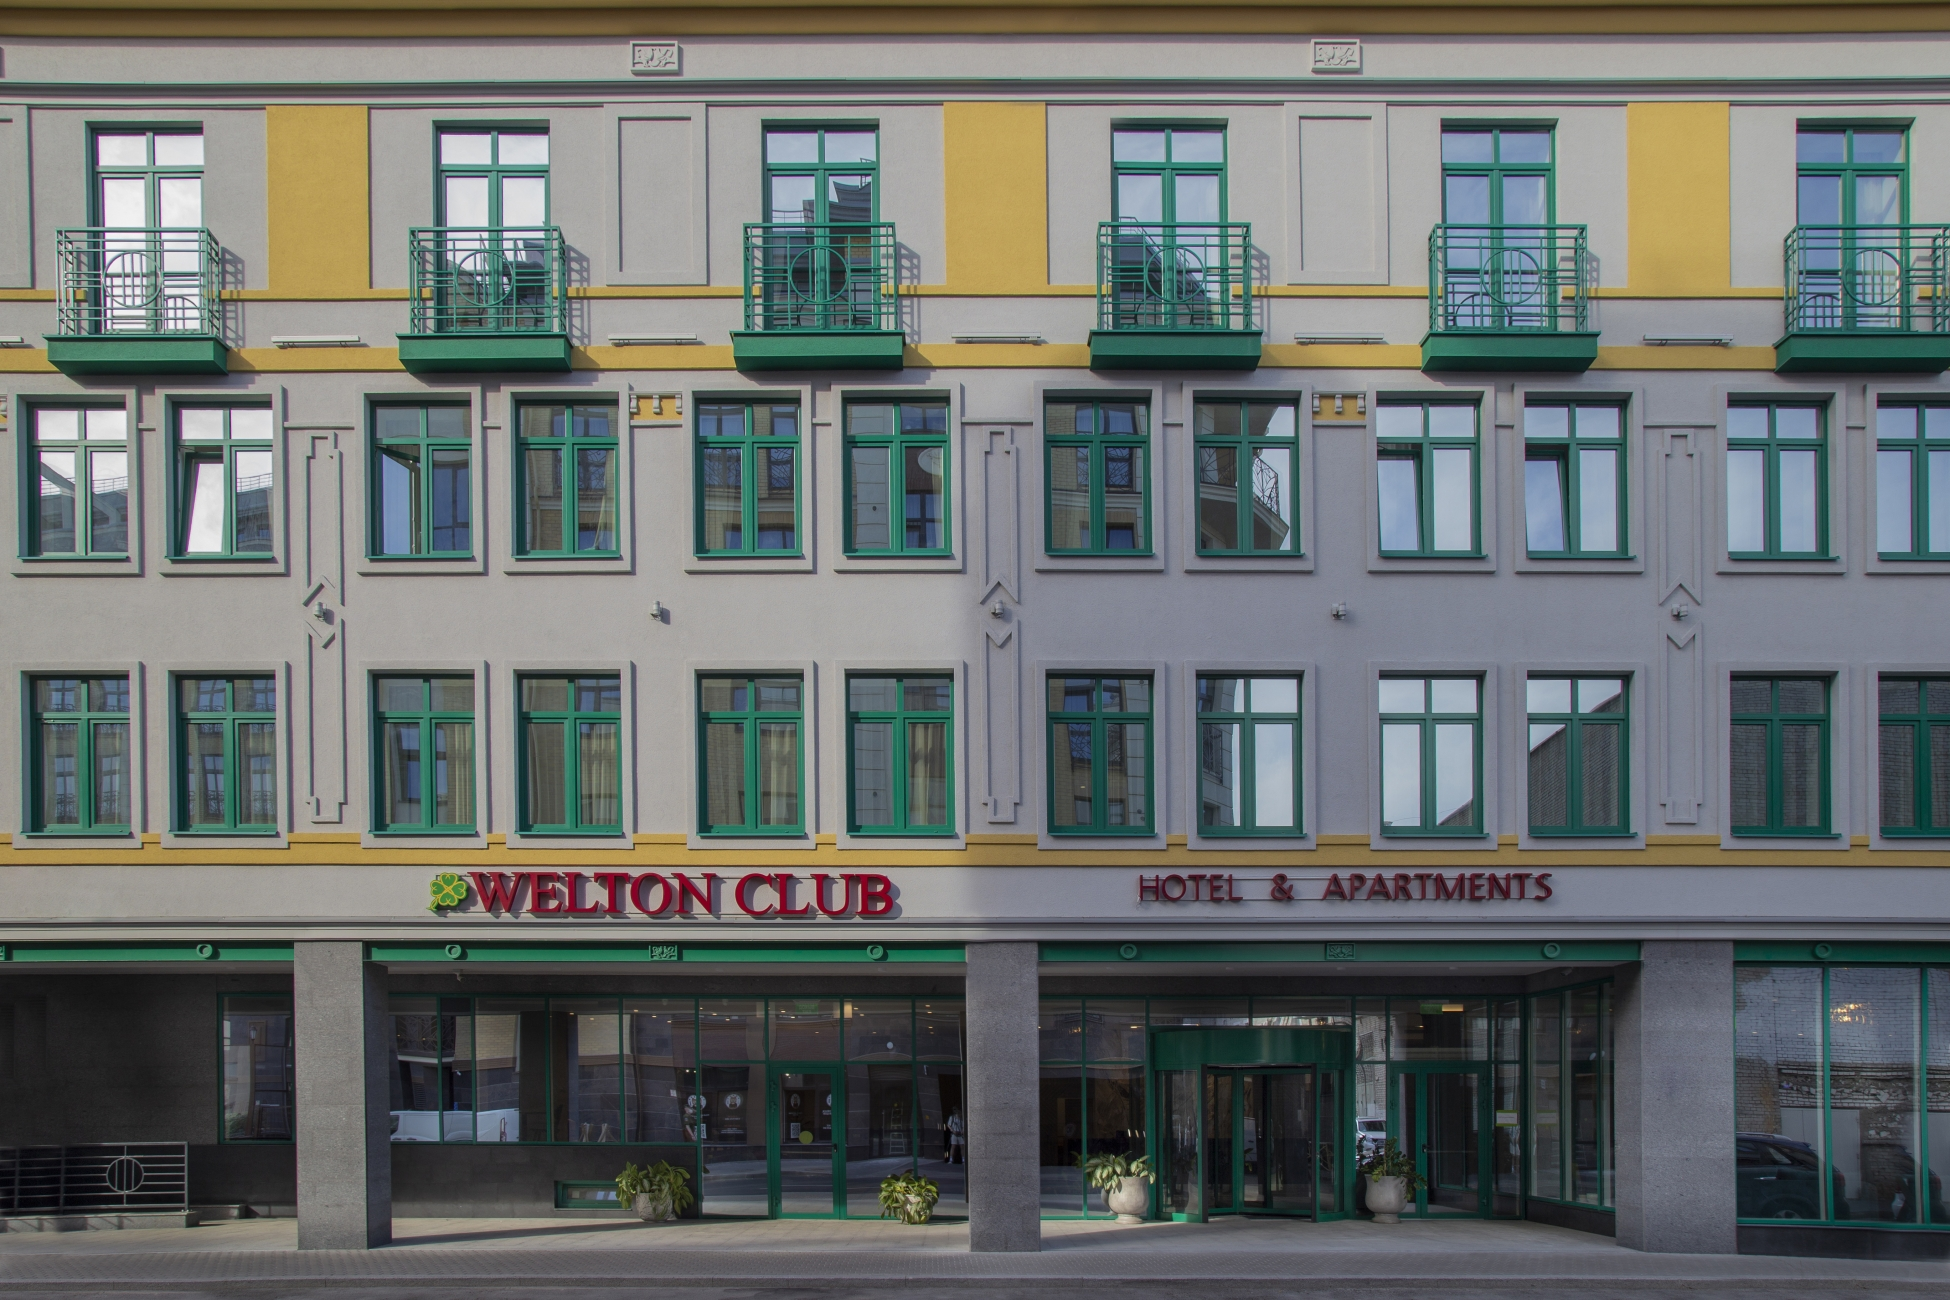 Welton Club Hotel & Apartments